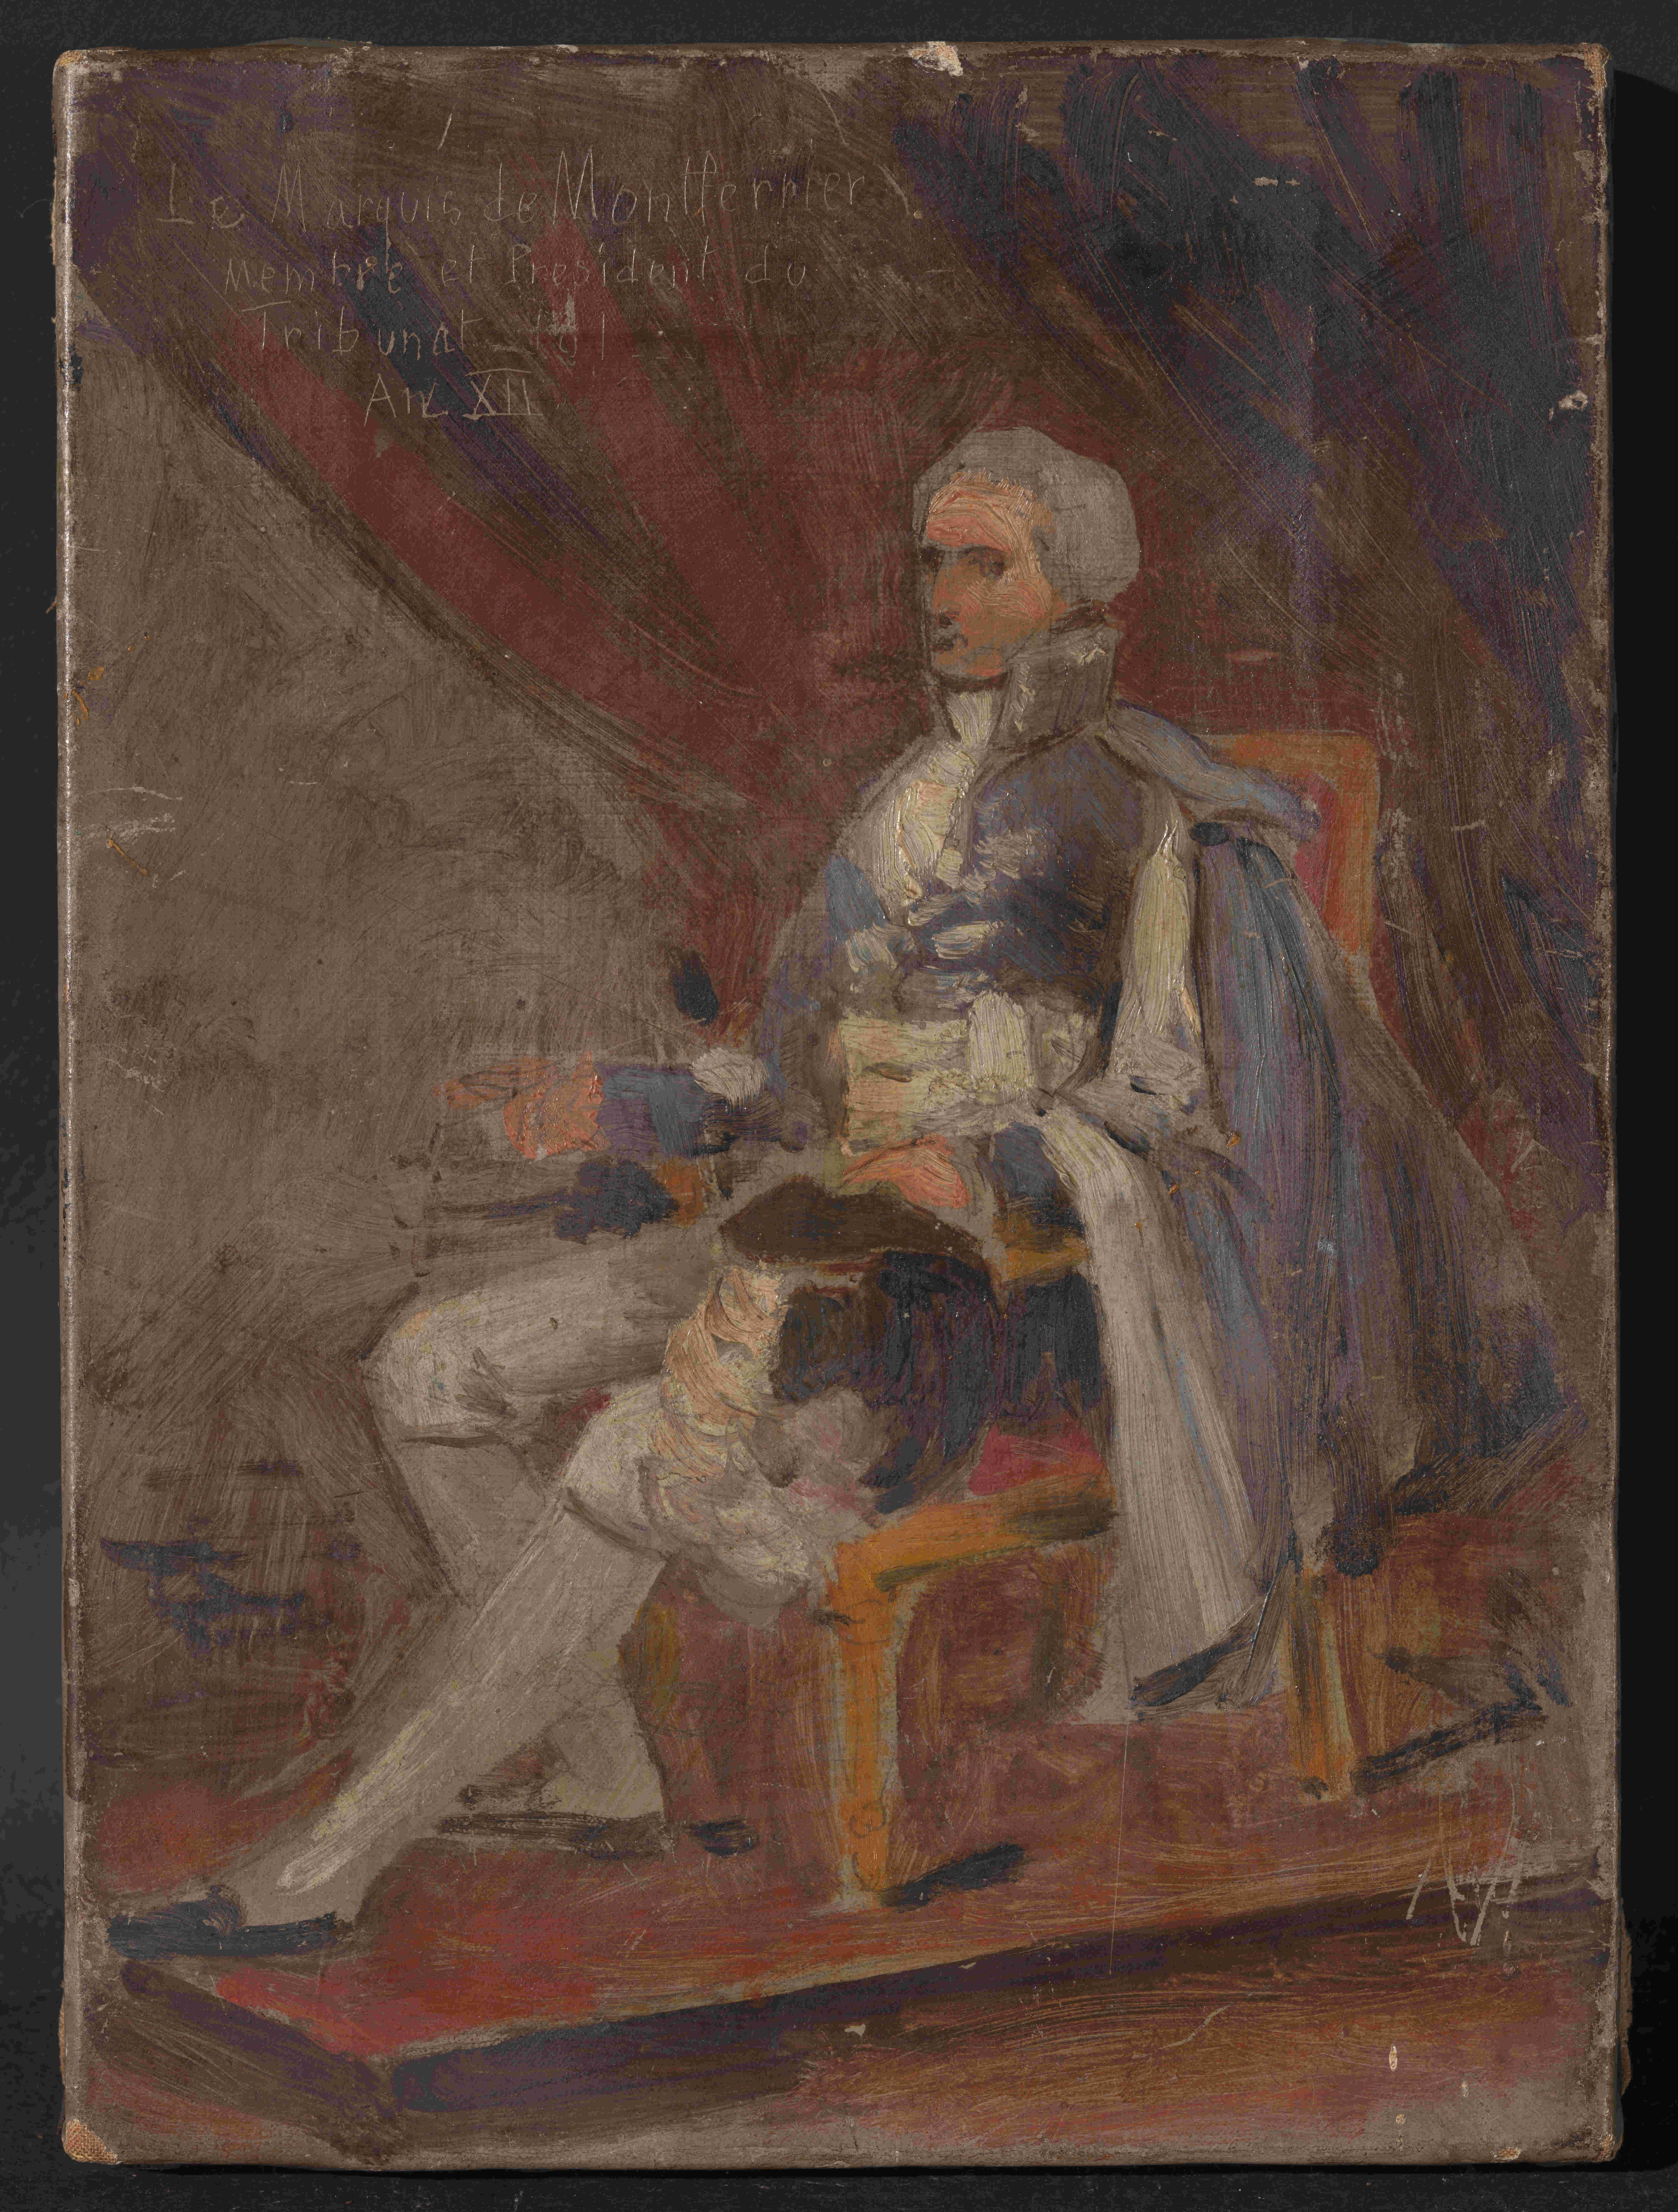 Duvidal President du Consulat 1804, esquisse de Julie Duvidal coll Gladysz Copyright KIK-IRPA,Bruxelles.